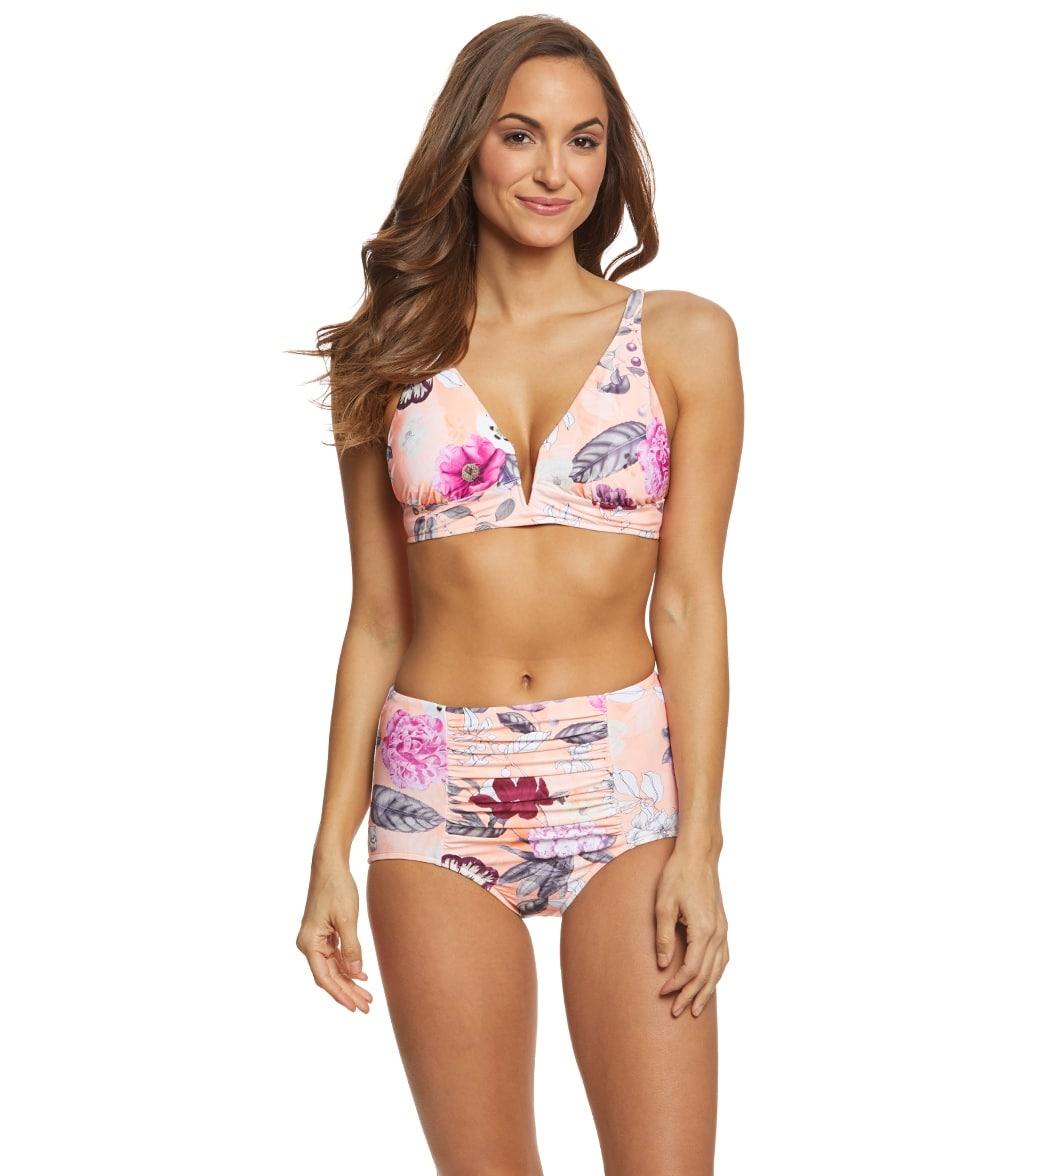 a1d8df49a5ab7 Seafolly Modern Love Longline Triangle Bikini Top at SwimOutlet.com ...